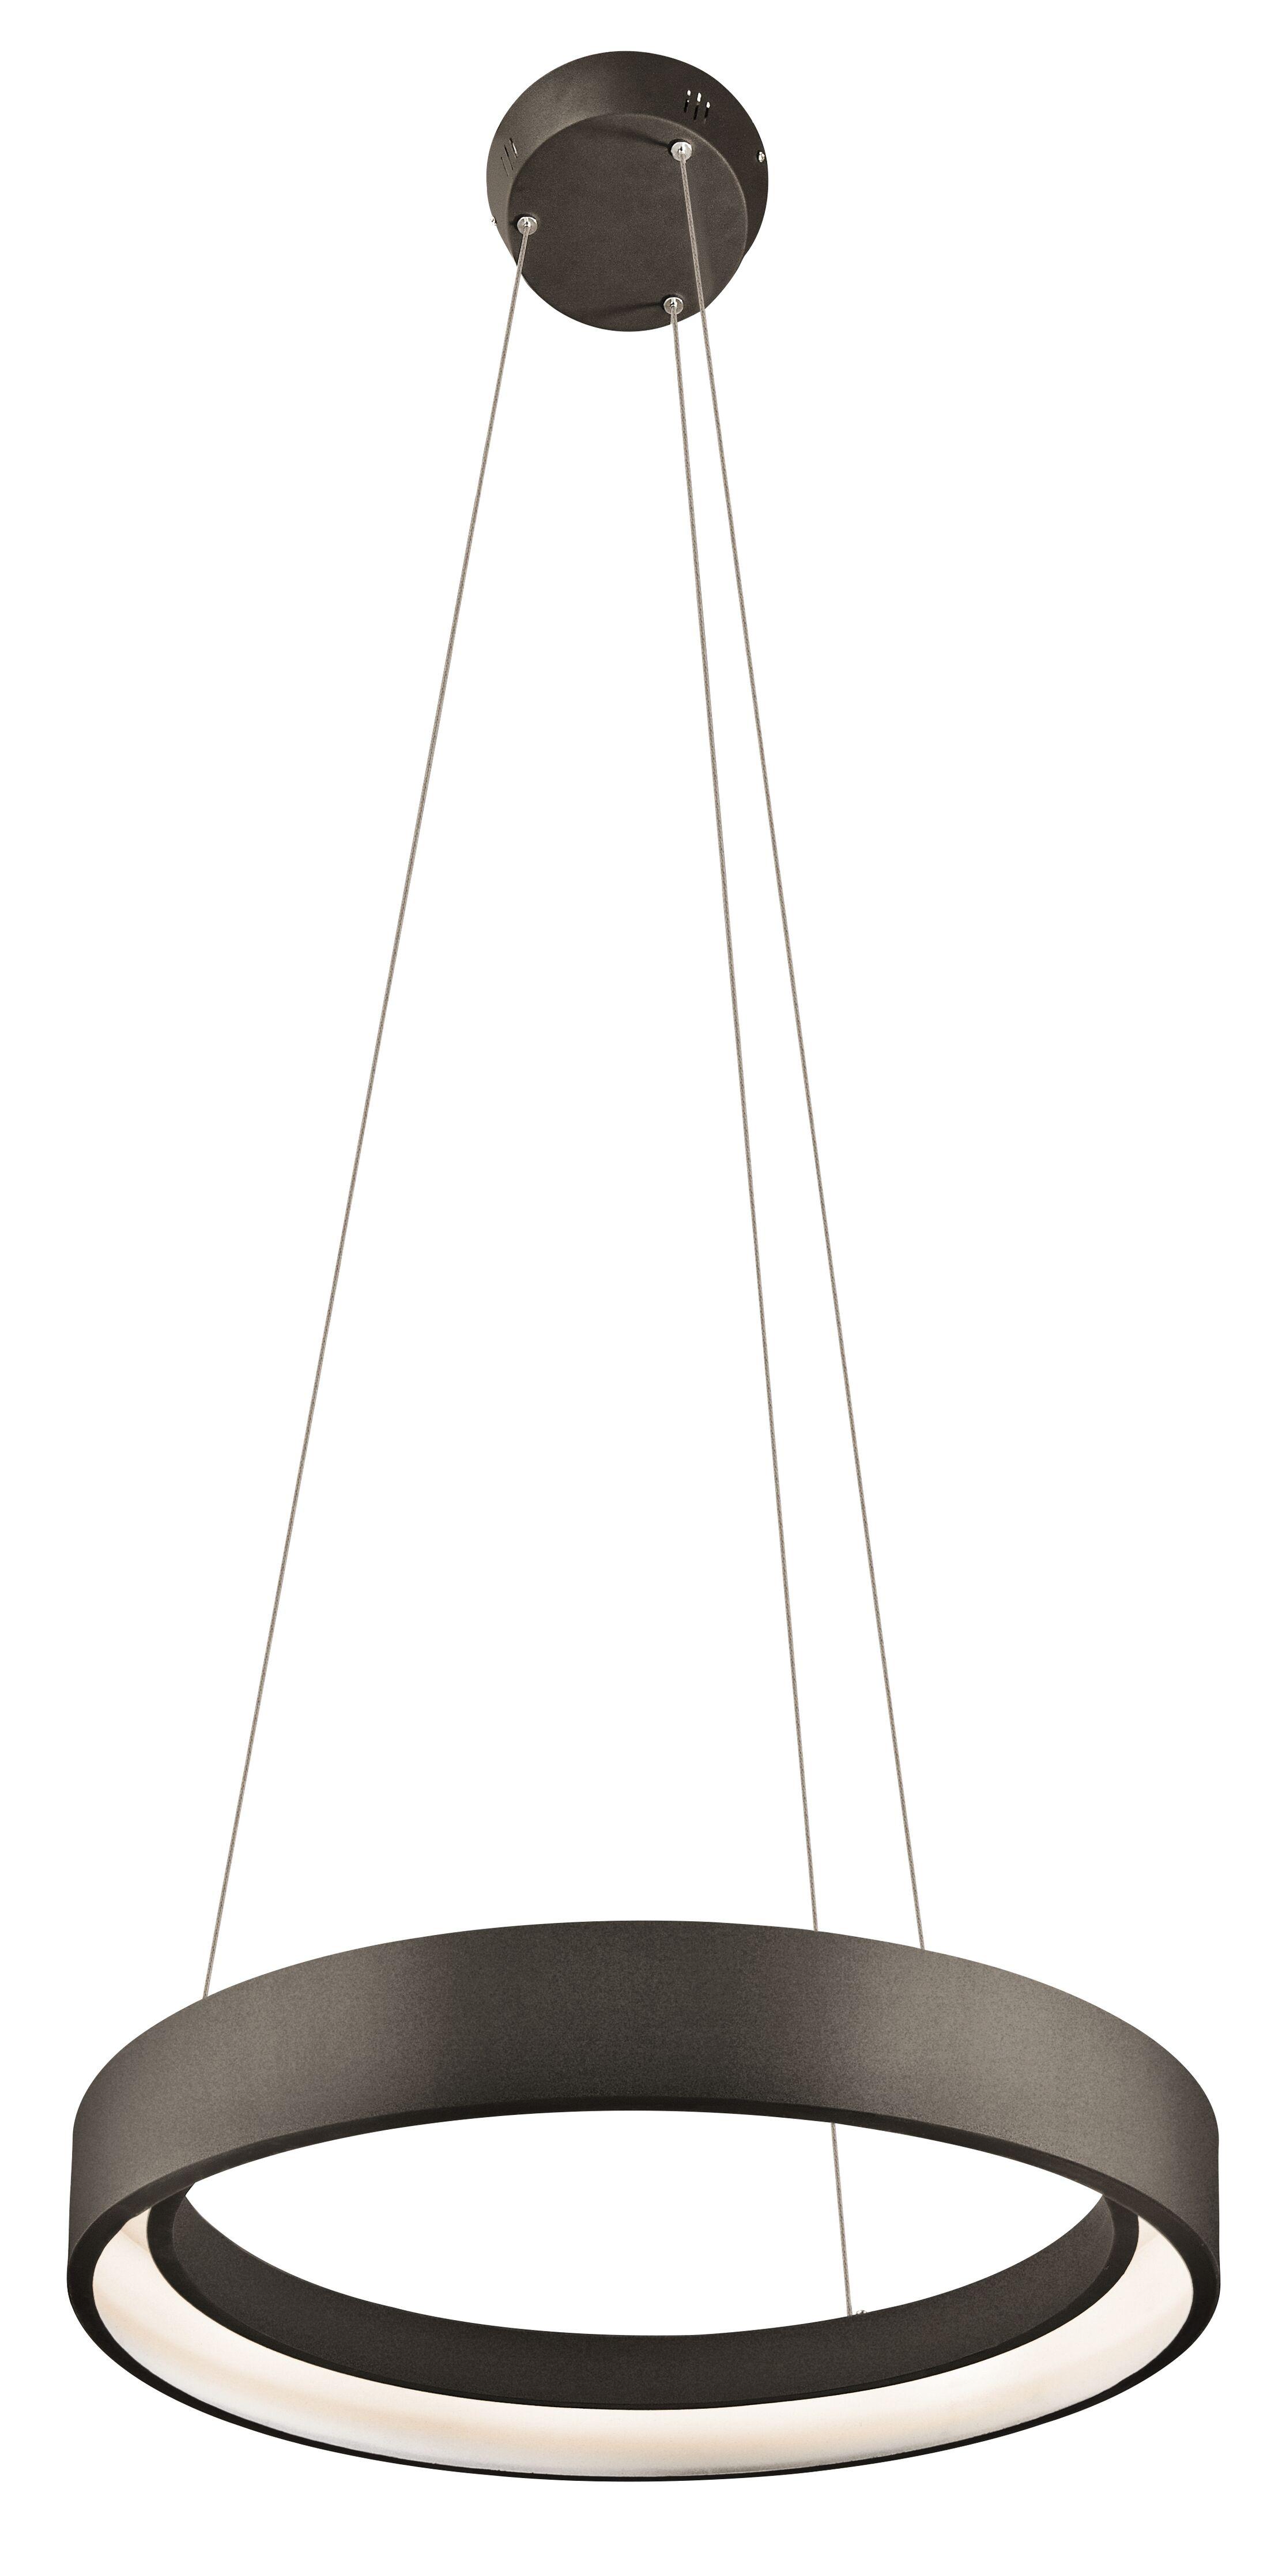 Rhianna  1-Light Drum Pendant Finish: Sand Textured Black, Size: 2.25